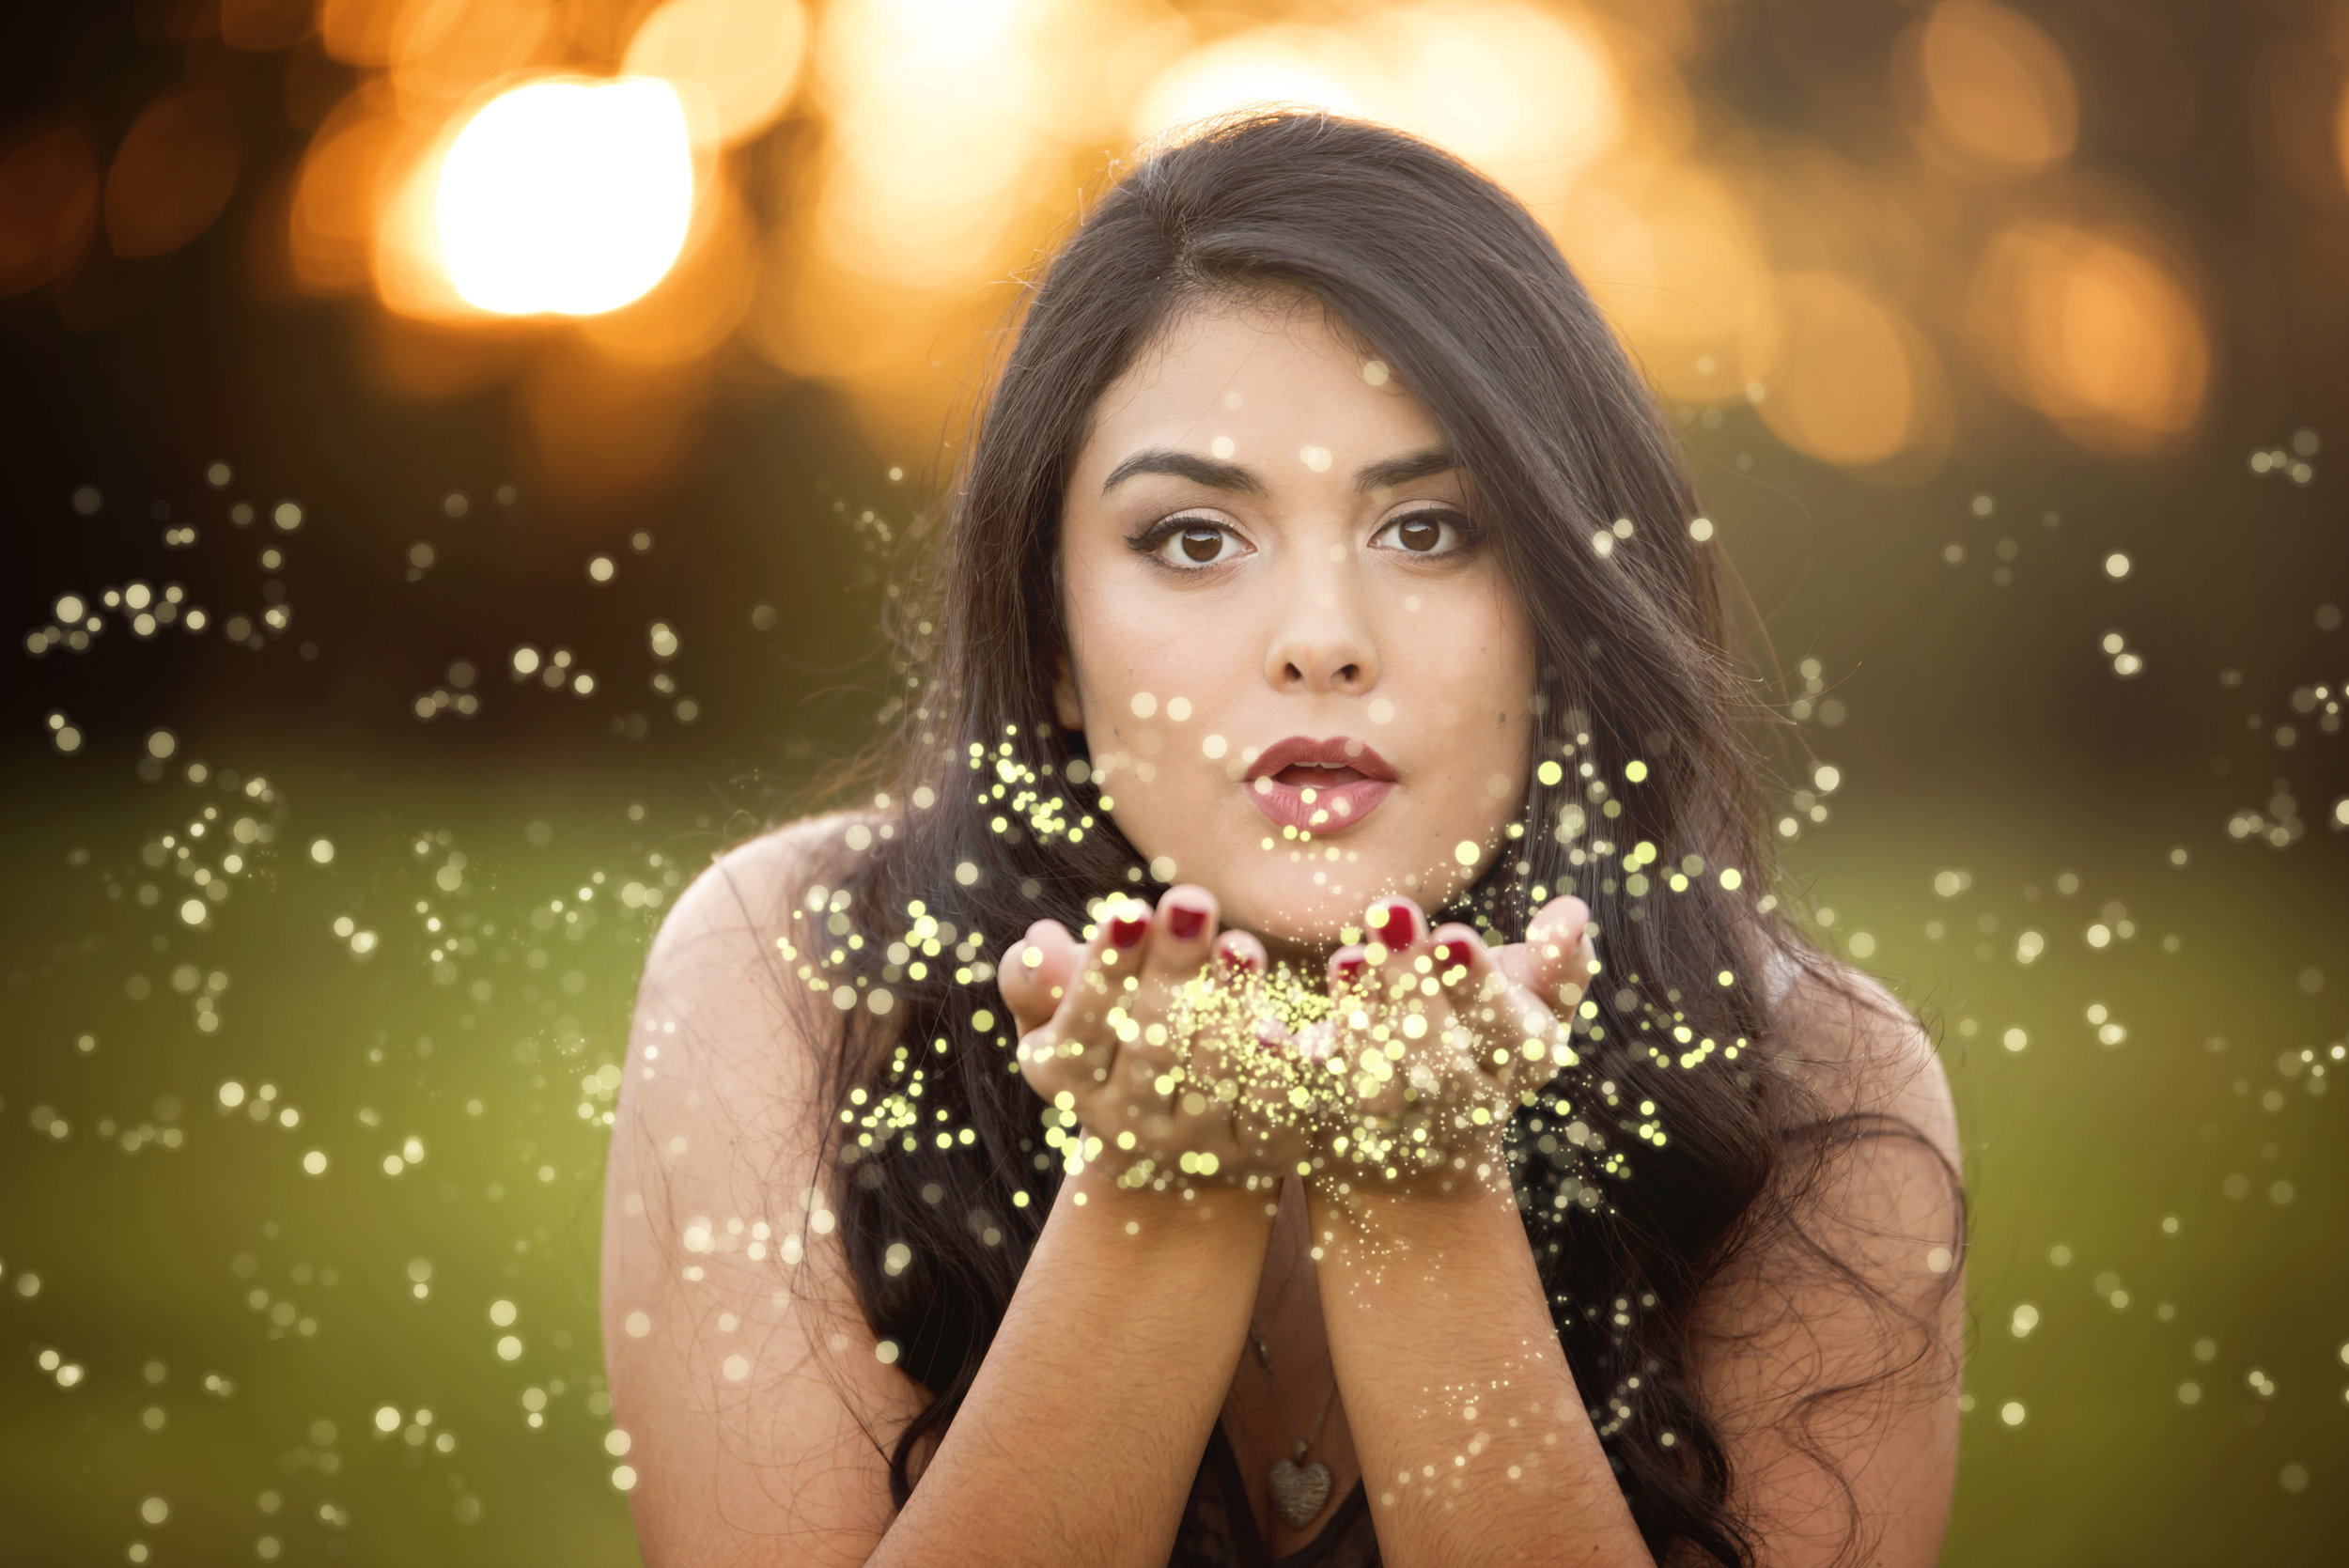 Reina-LeGrand-Photography-Photographer-Senior-azle-beauty-DFW-Dallas-Fort-Worth-Denton-Southlake-Colleyville-Grapevine-Roanoke-Keller-Westlake-Portrait-Portraiture-Photo-Session-yaritza-argyle.jpg